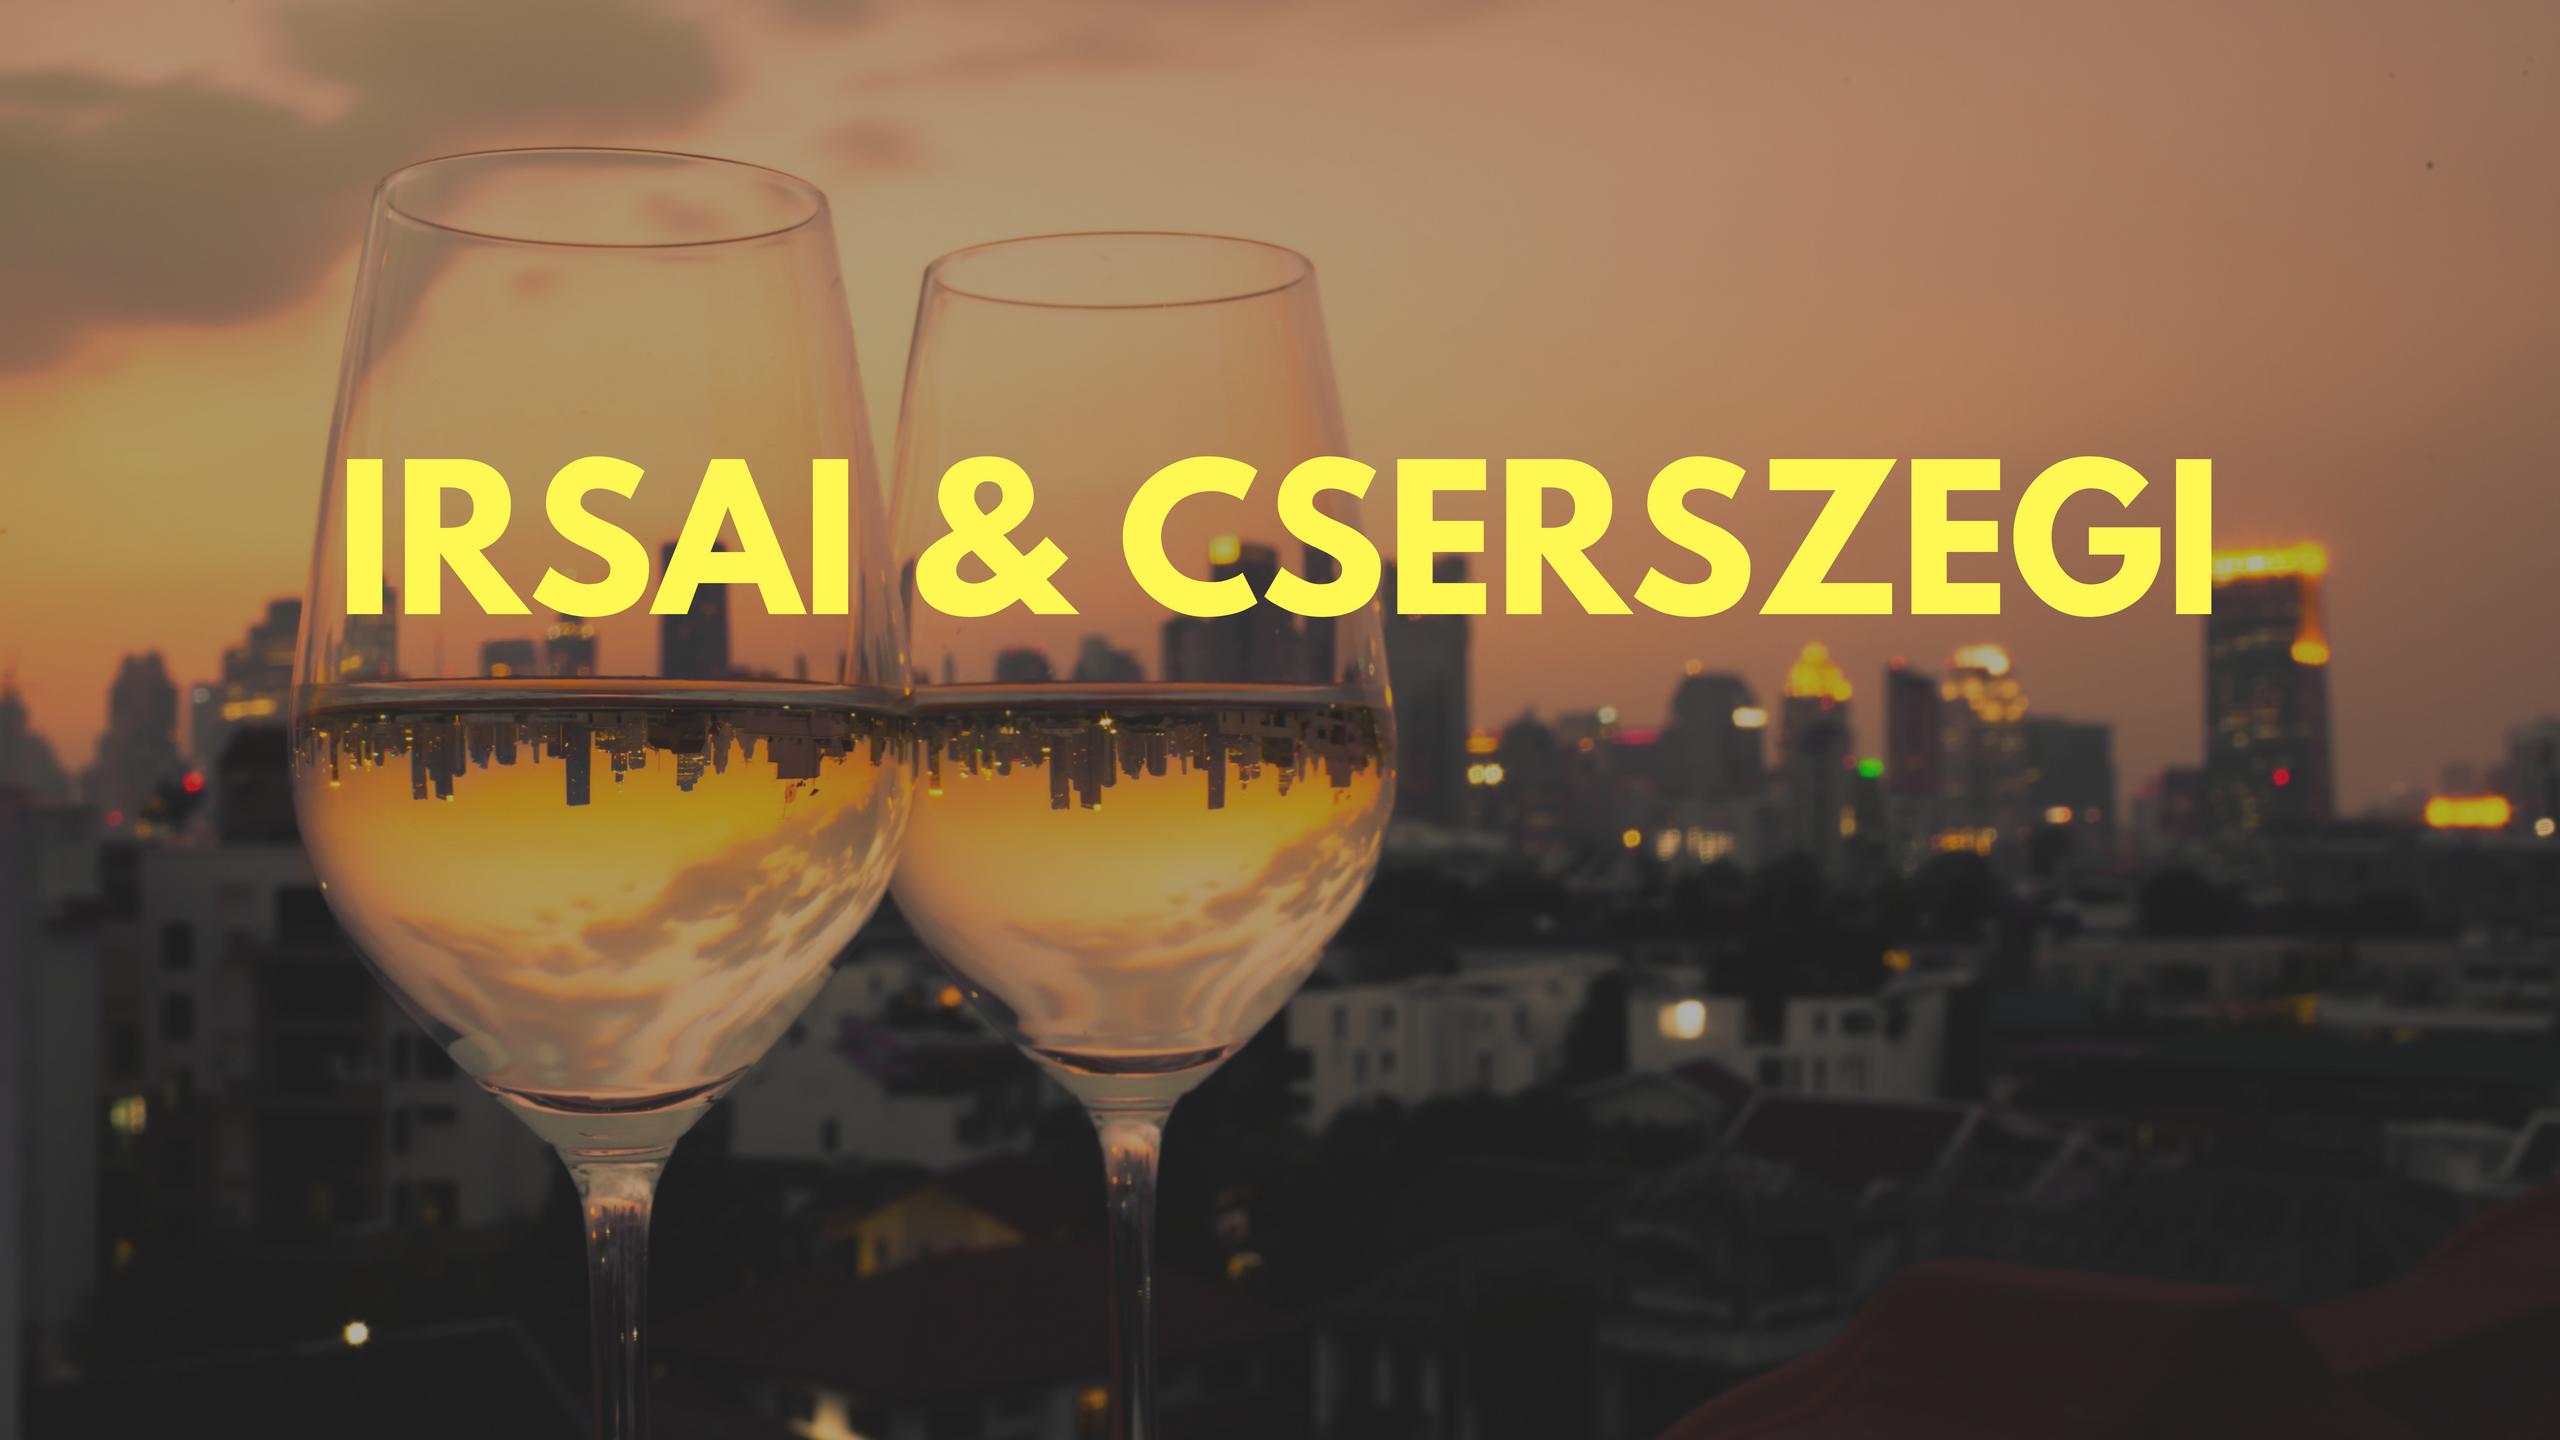 irsai_cserszegi.png